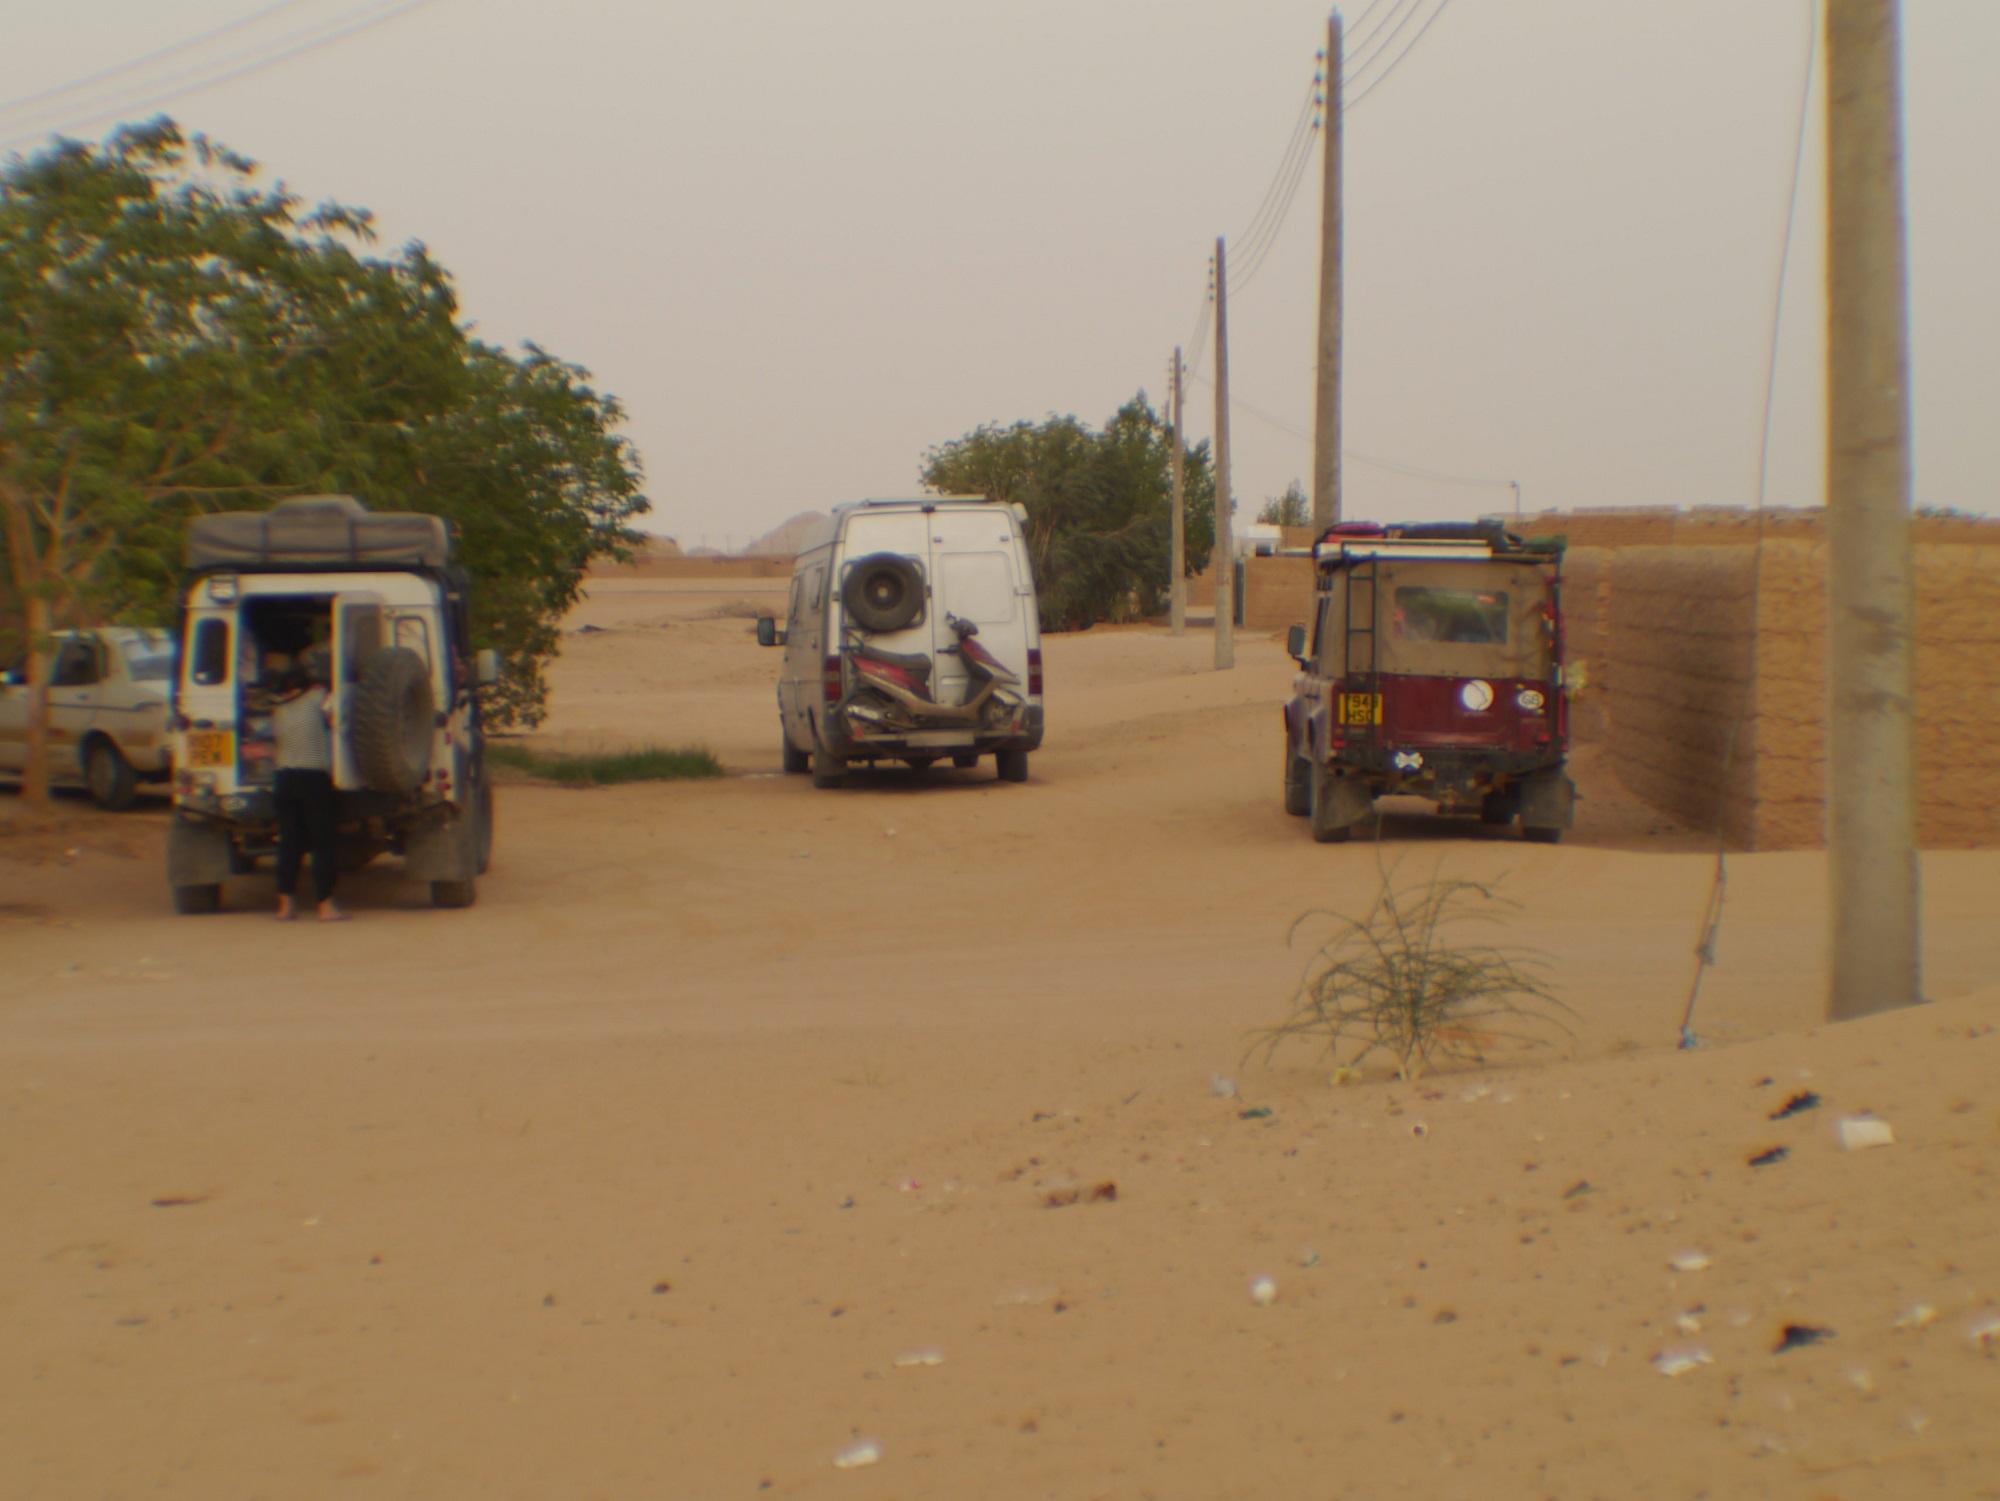 2014-CMCPHERSON-SUDAN-43